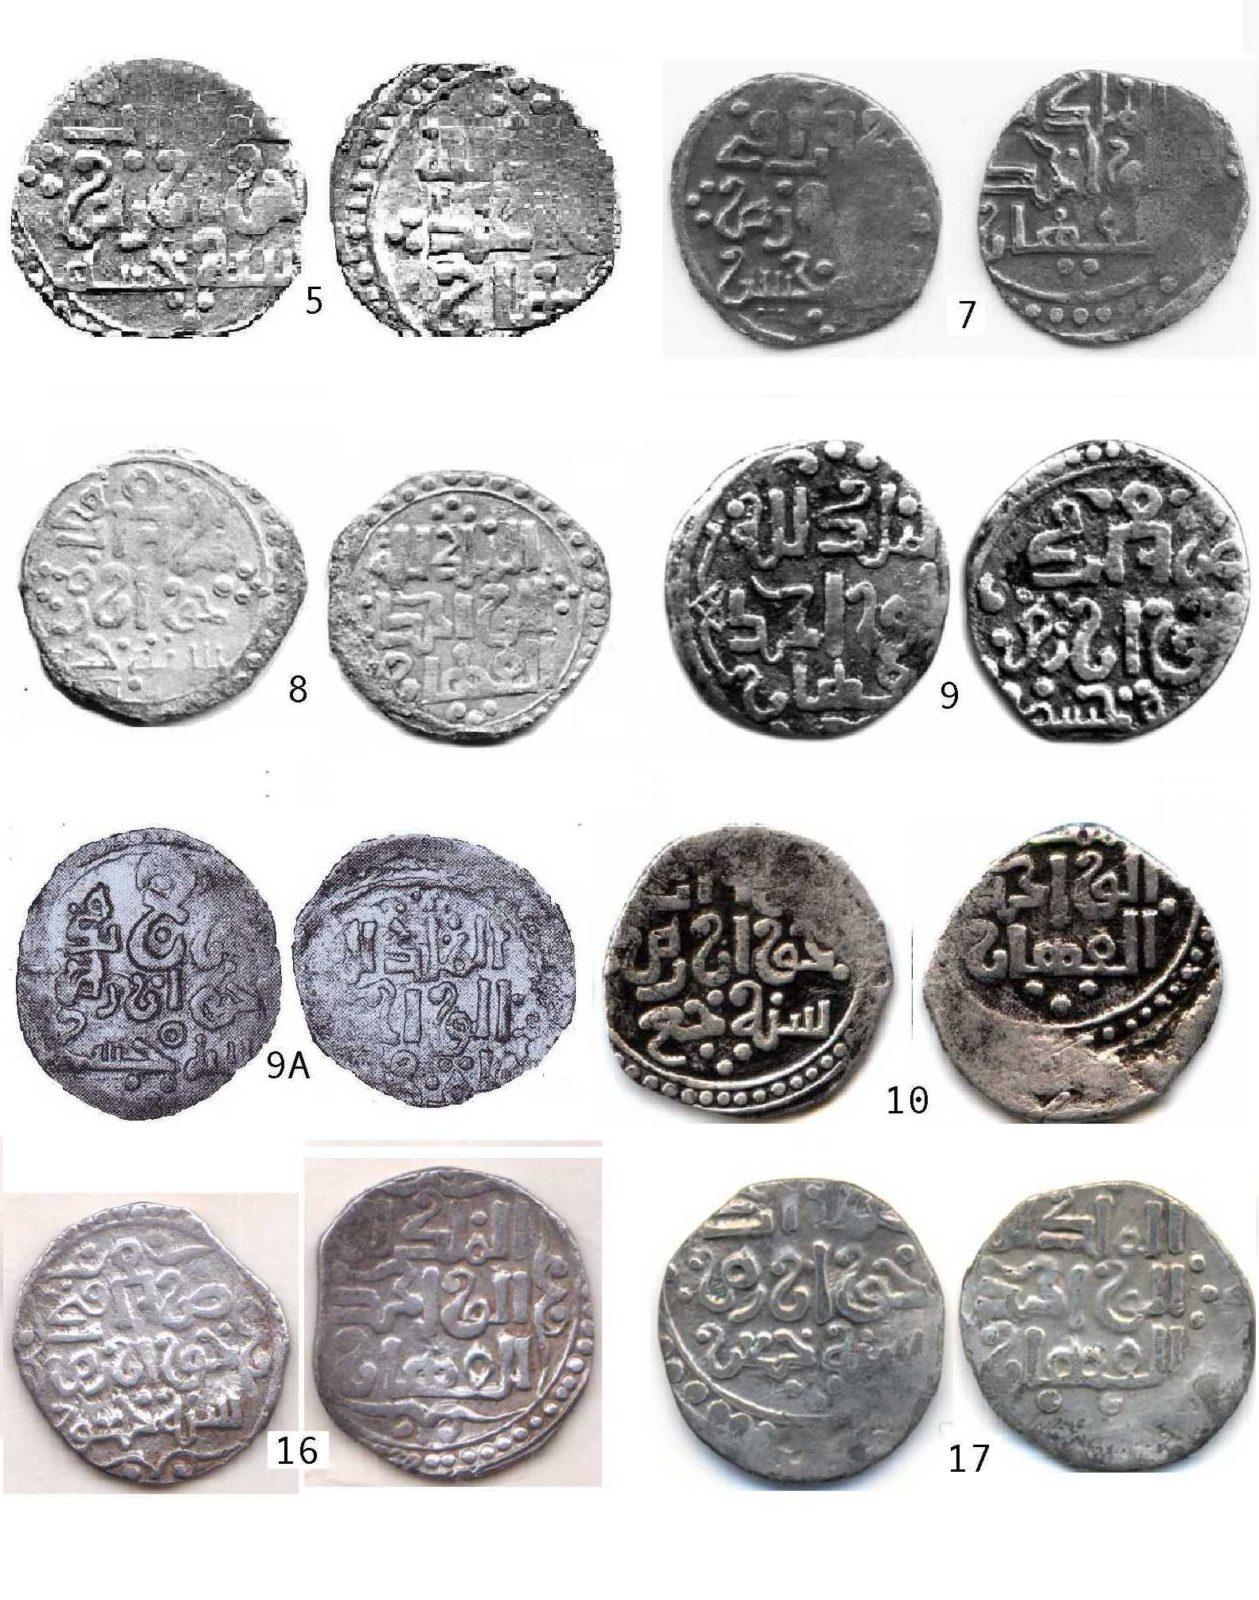 Фото 2. Снимки анонимных дирхемов Хорезма, датированных хронограммами абджад 665-677 гг.х.